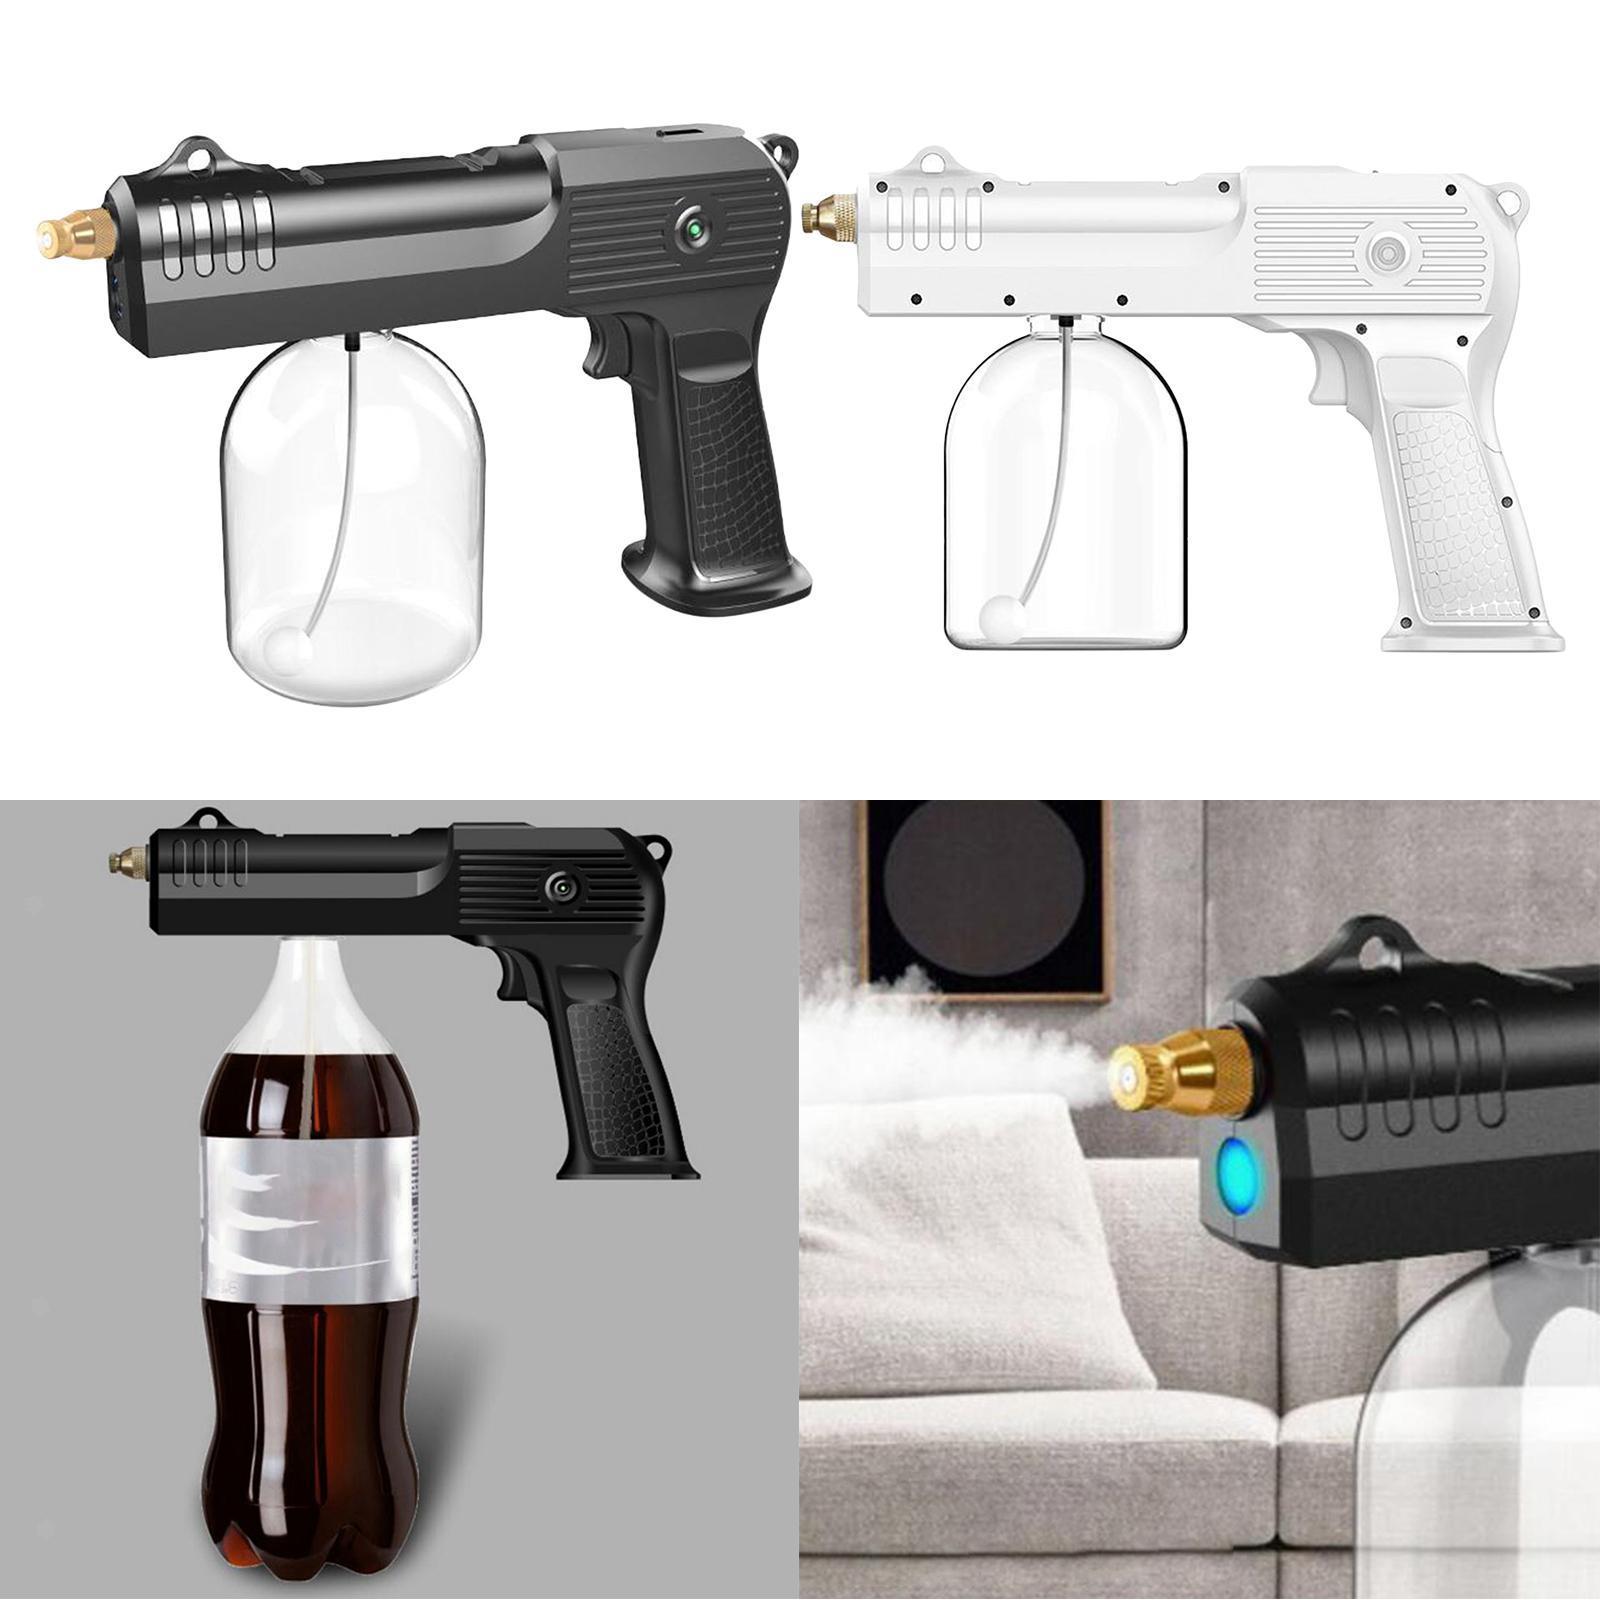 thumbnail 8 - 2x Cordless USB Nano Sanitizer Sprayer Disinfectant Fogger 500ml Spray Gun